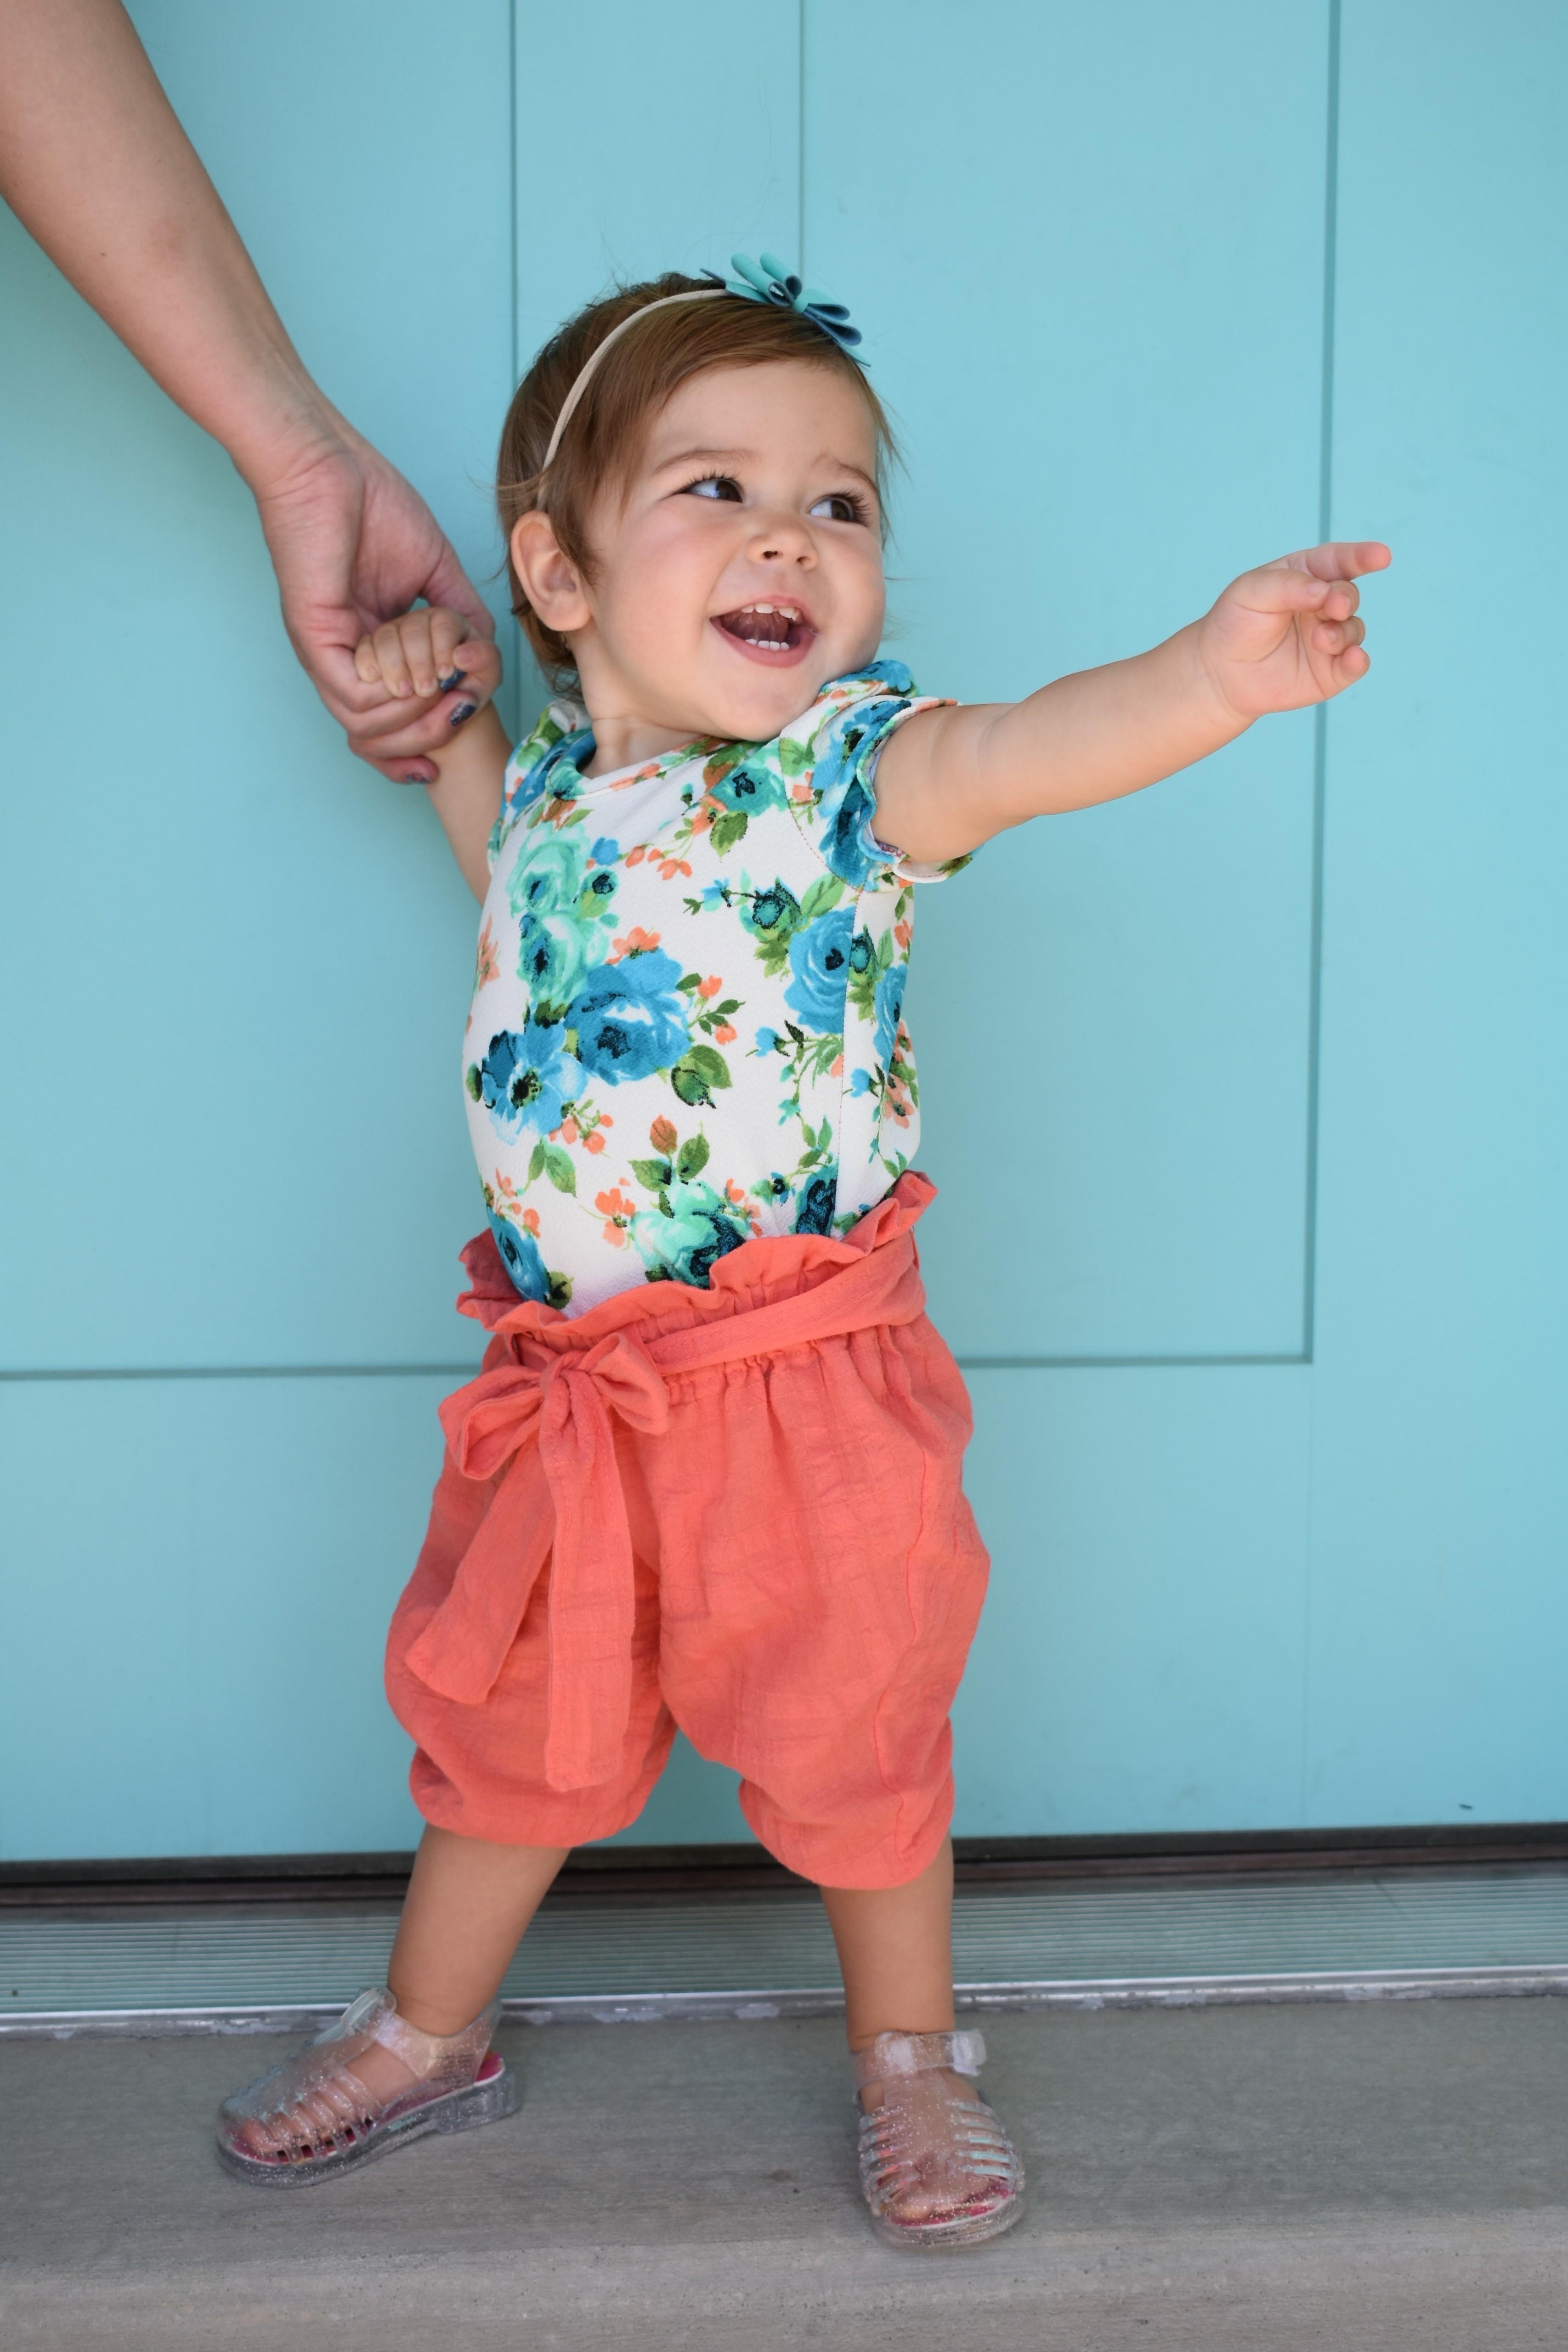 Century's High Waisted Elastic & Paperbag Pants, Capris, & Shorts Sizes NB to 14 Kids PDF Pattern